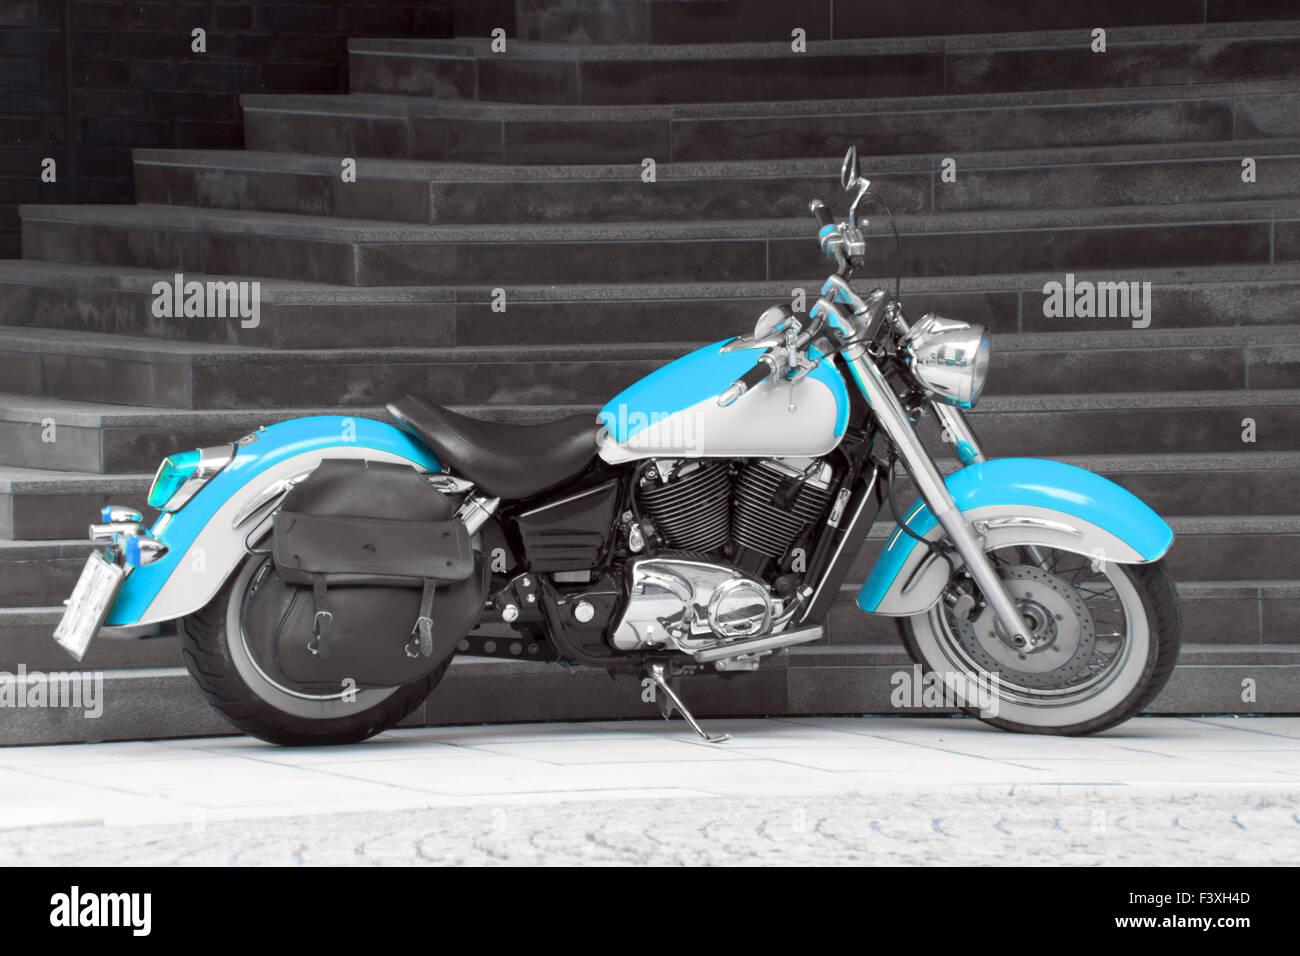 Motorbike in turquoise II. Stock Photo